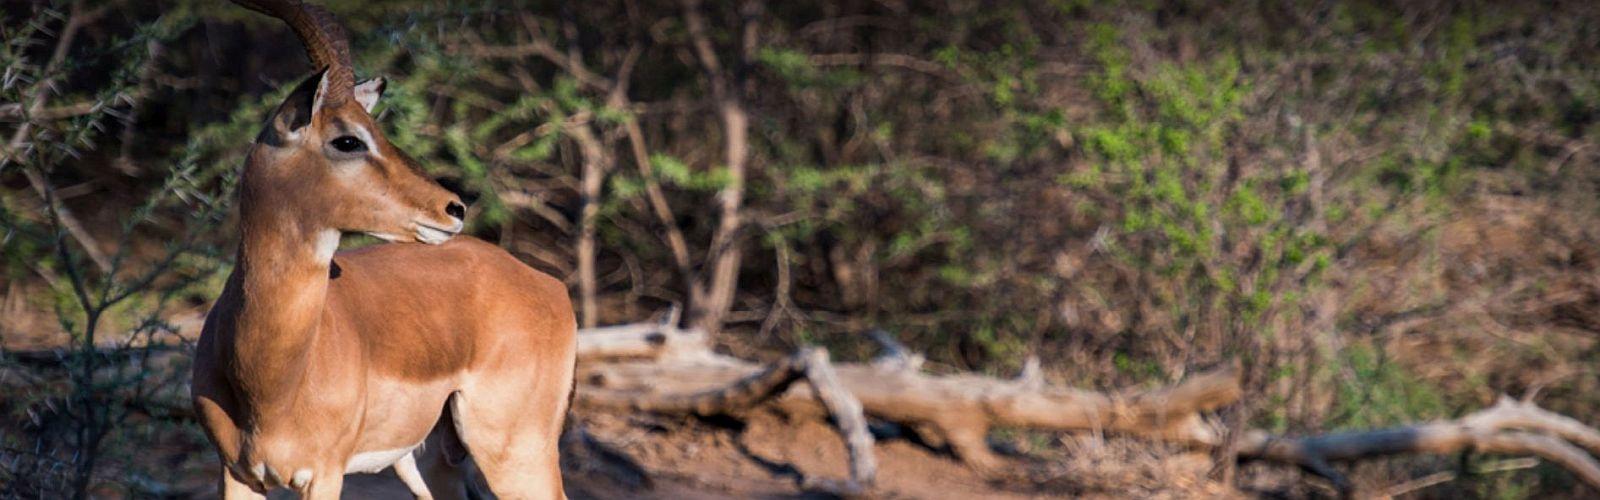 Malariavrije wildparken